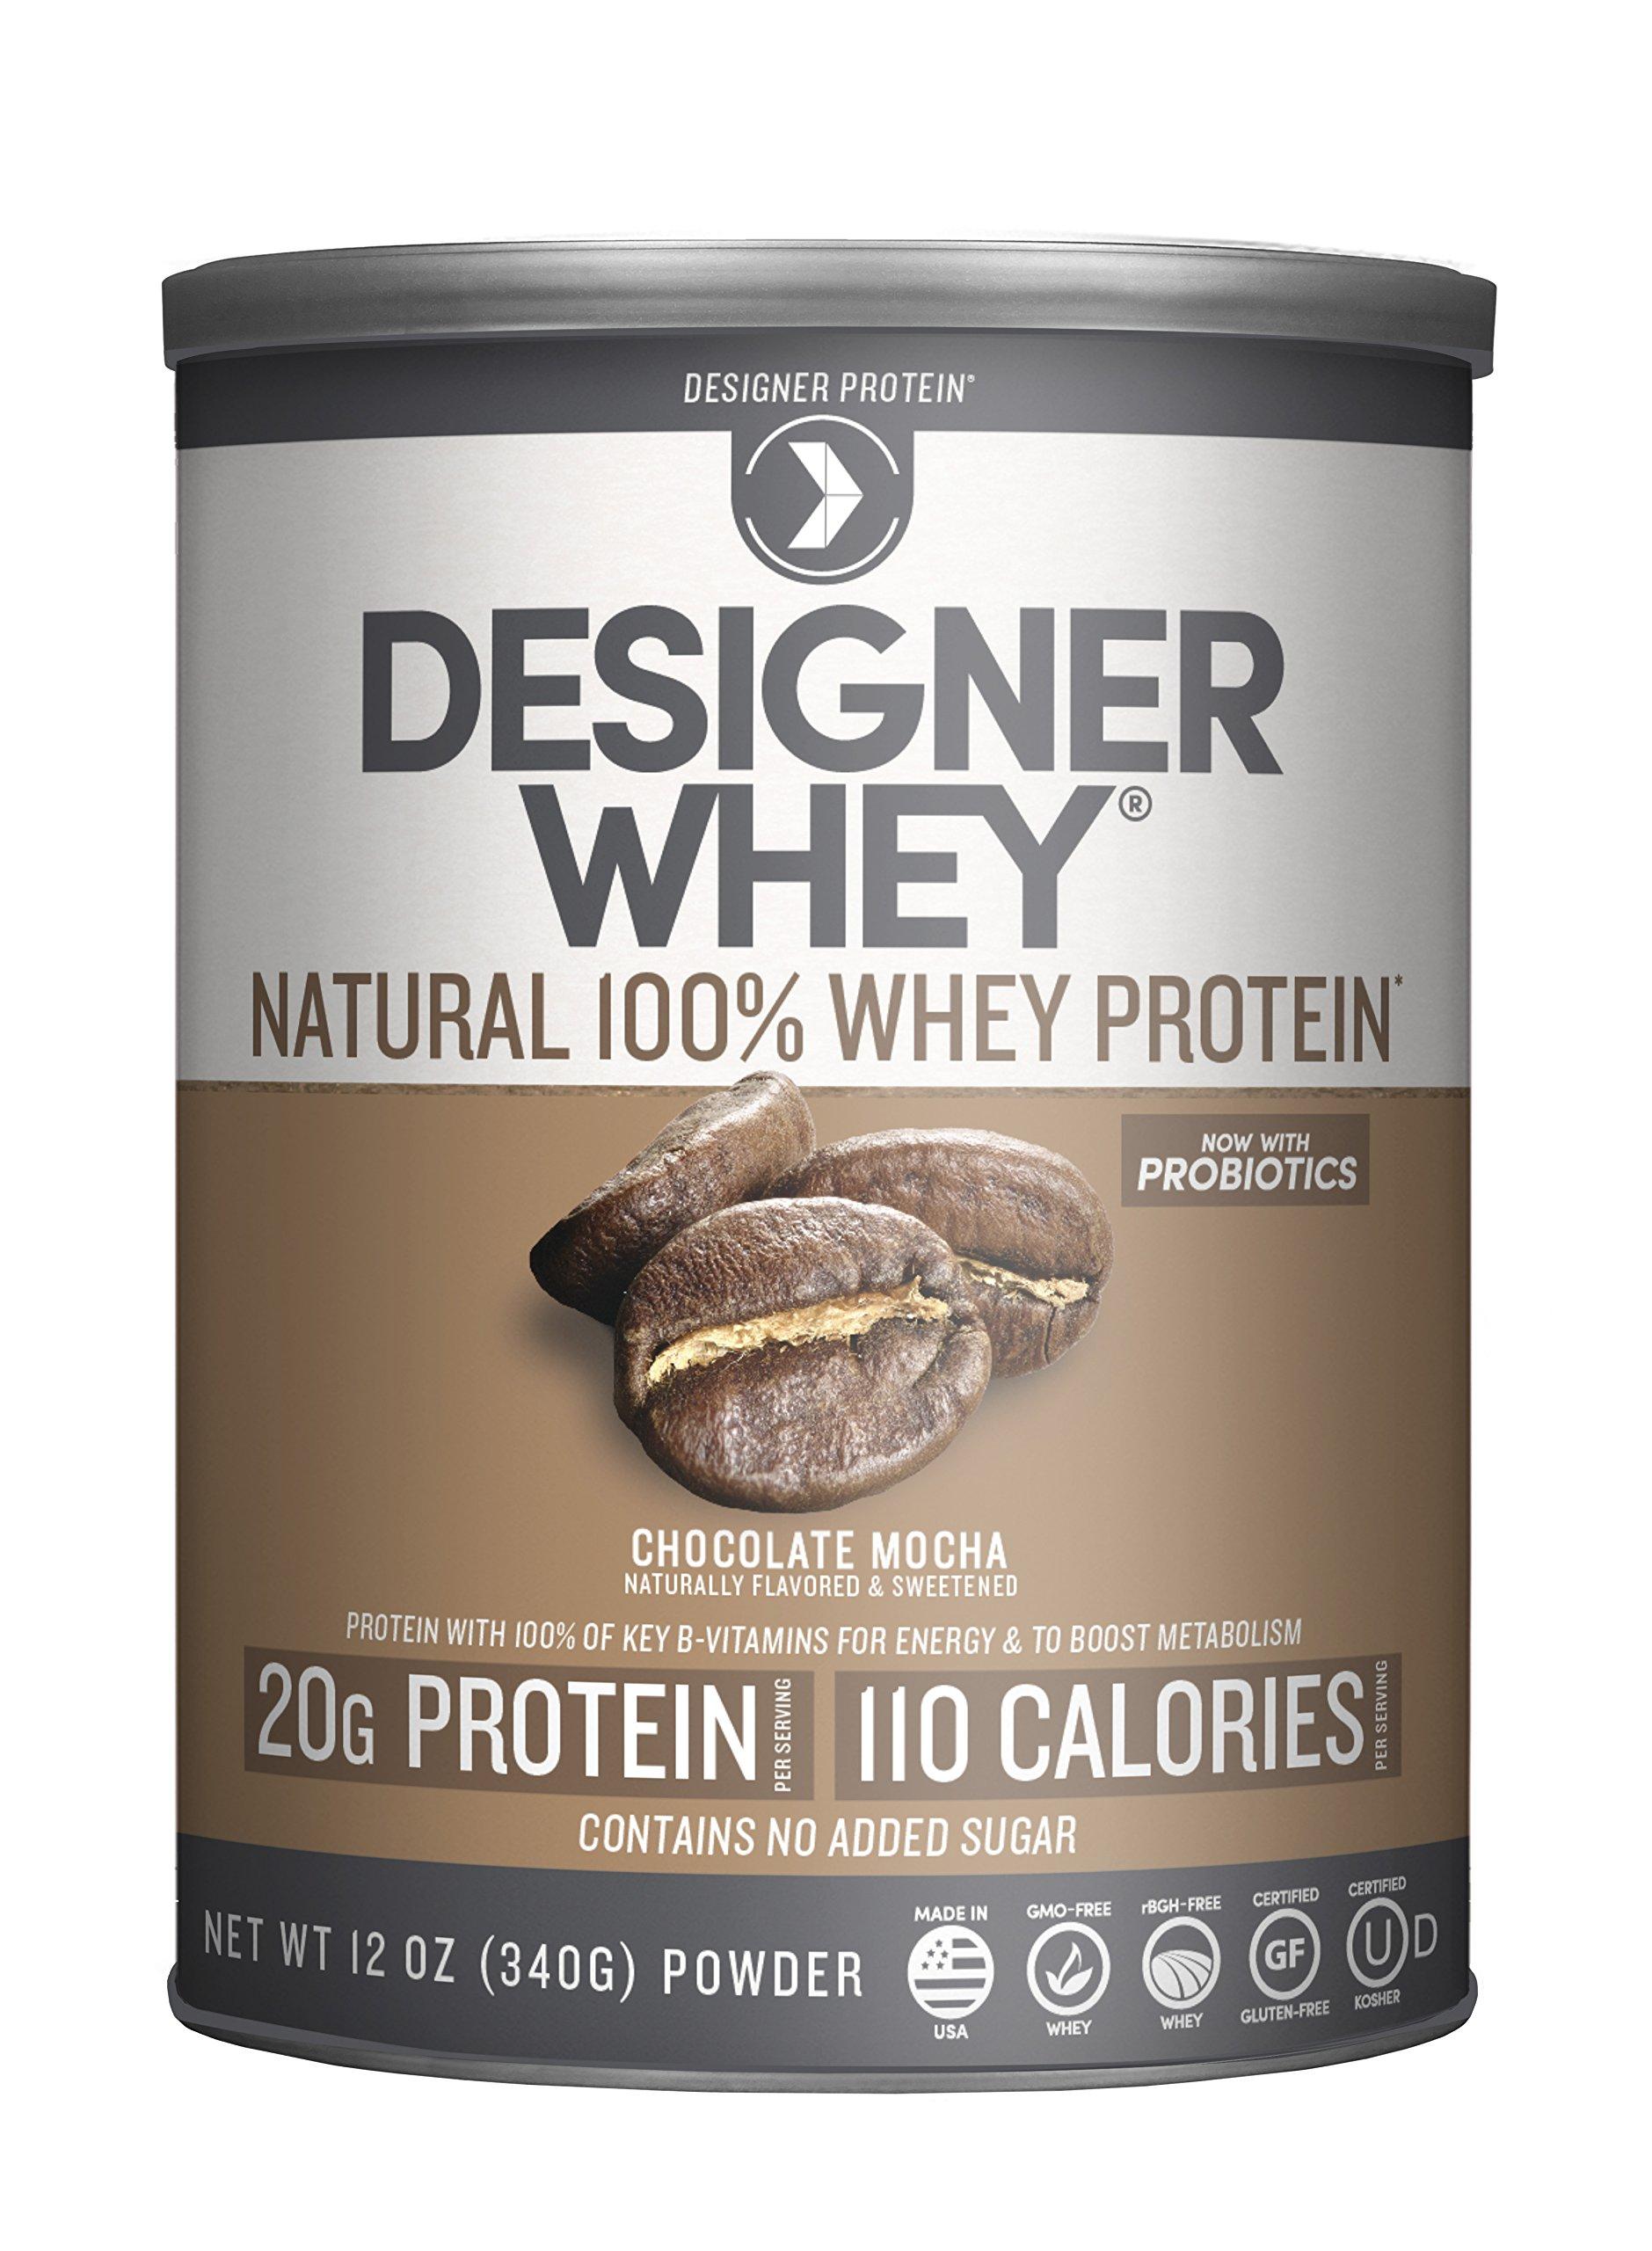 Designer Protein Whey Premium Natural 100% Whey Protein, Chocolate Mocha, 12 Ounce